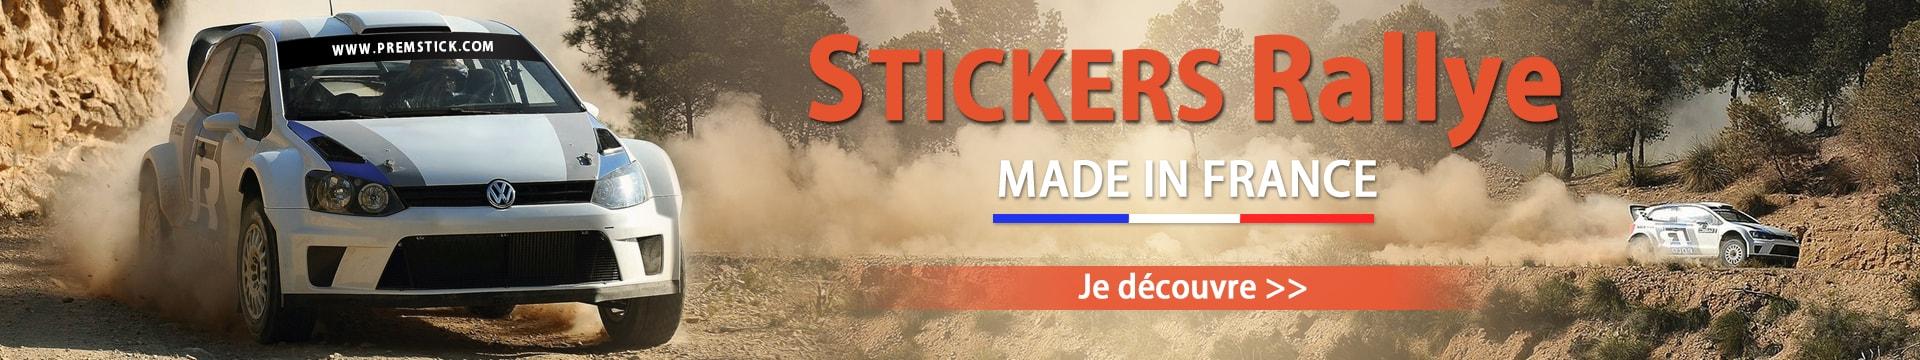 Stickers Rallye